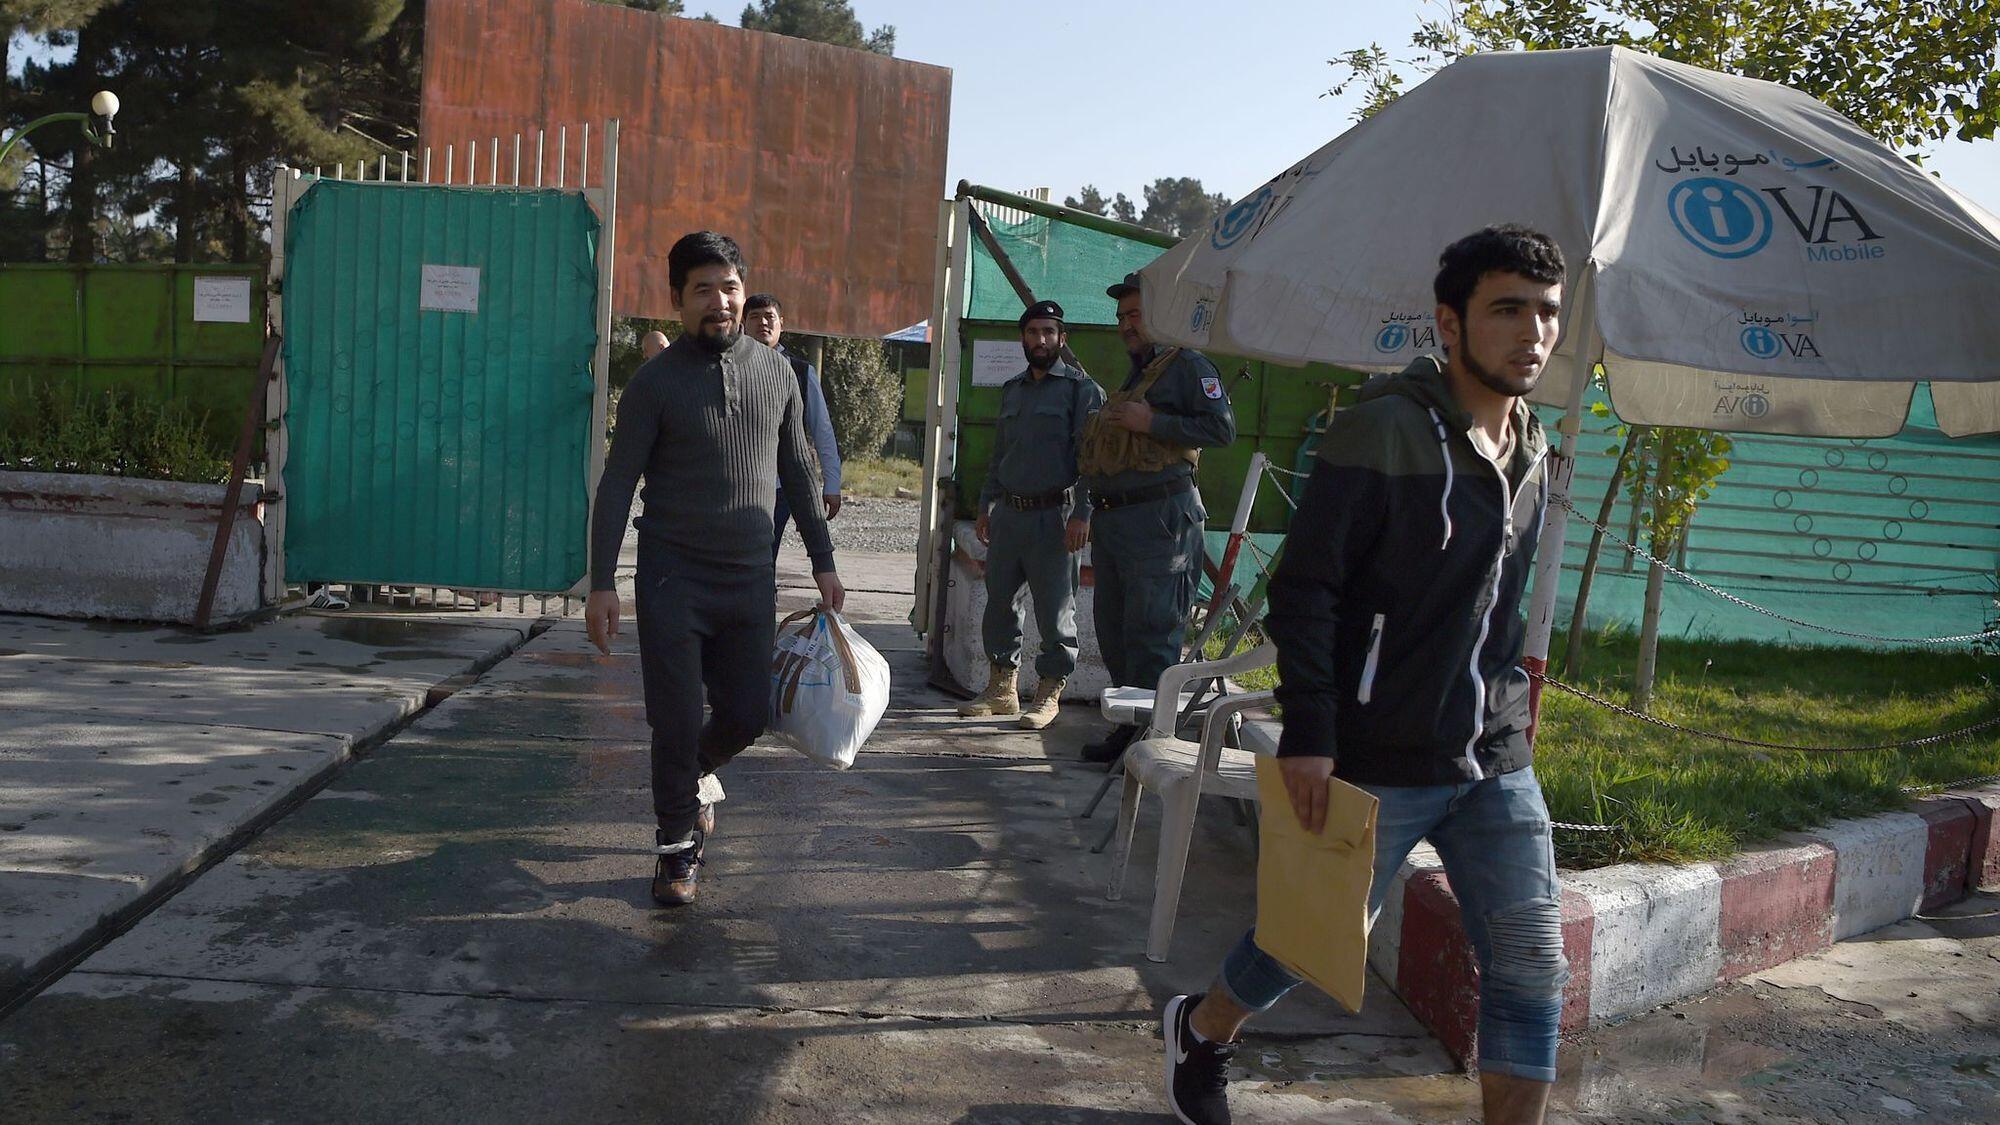 arrivee-a-l-aeroport-international-de-kaboul-de-refugies-afghans-expulses-d-allemagne